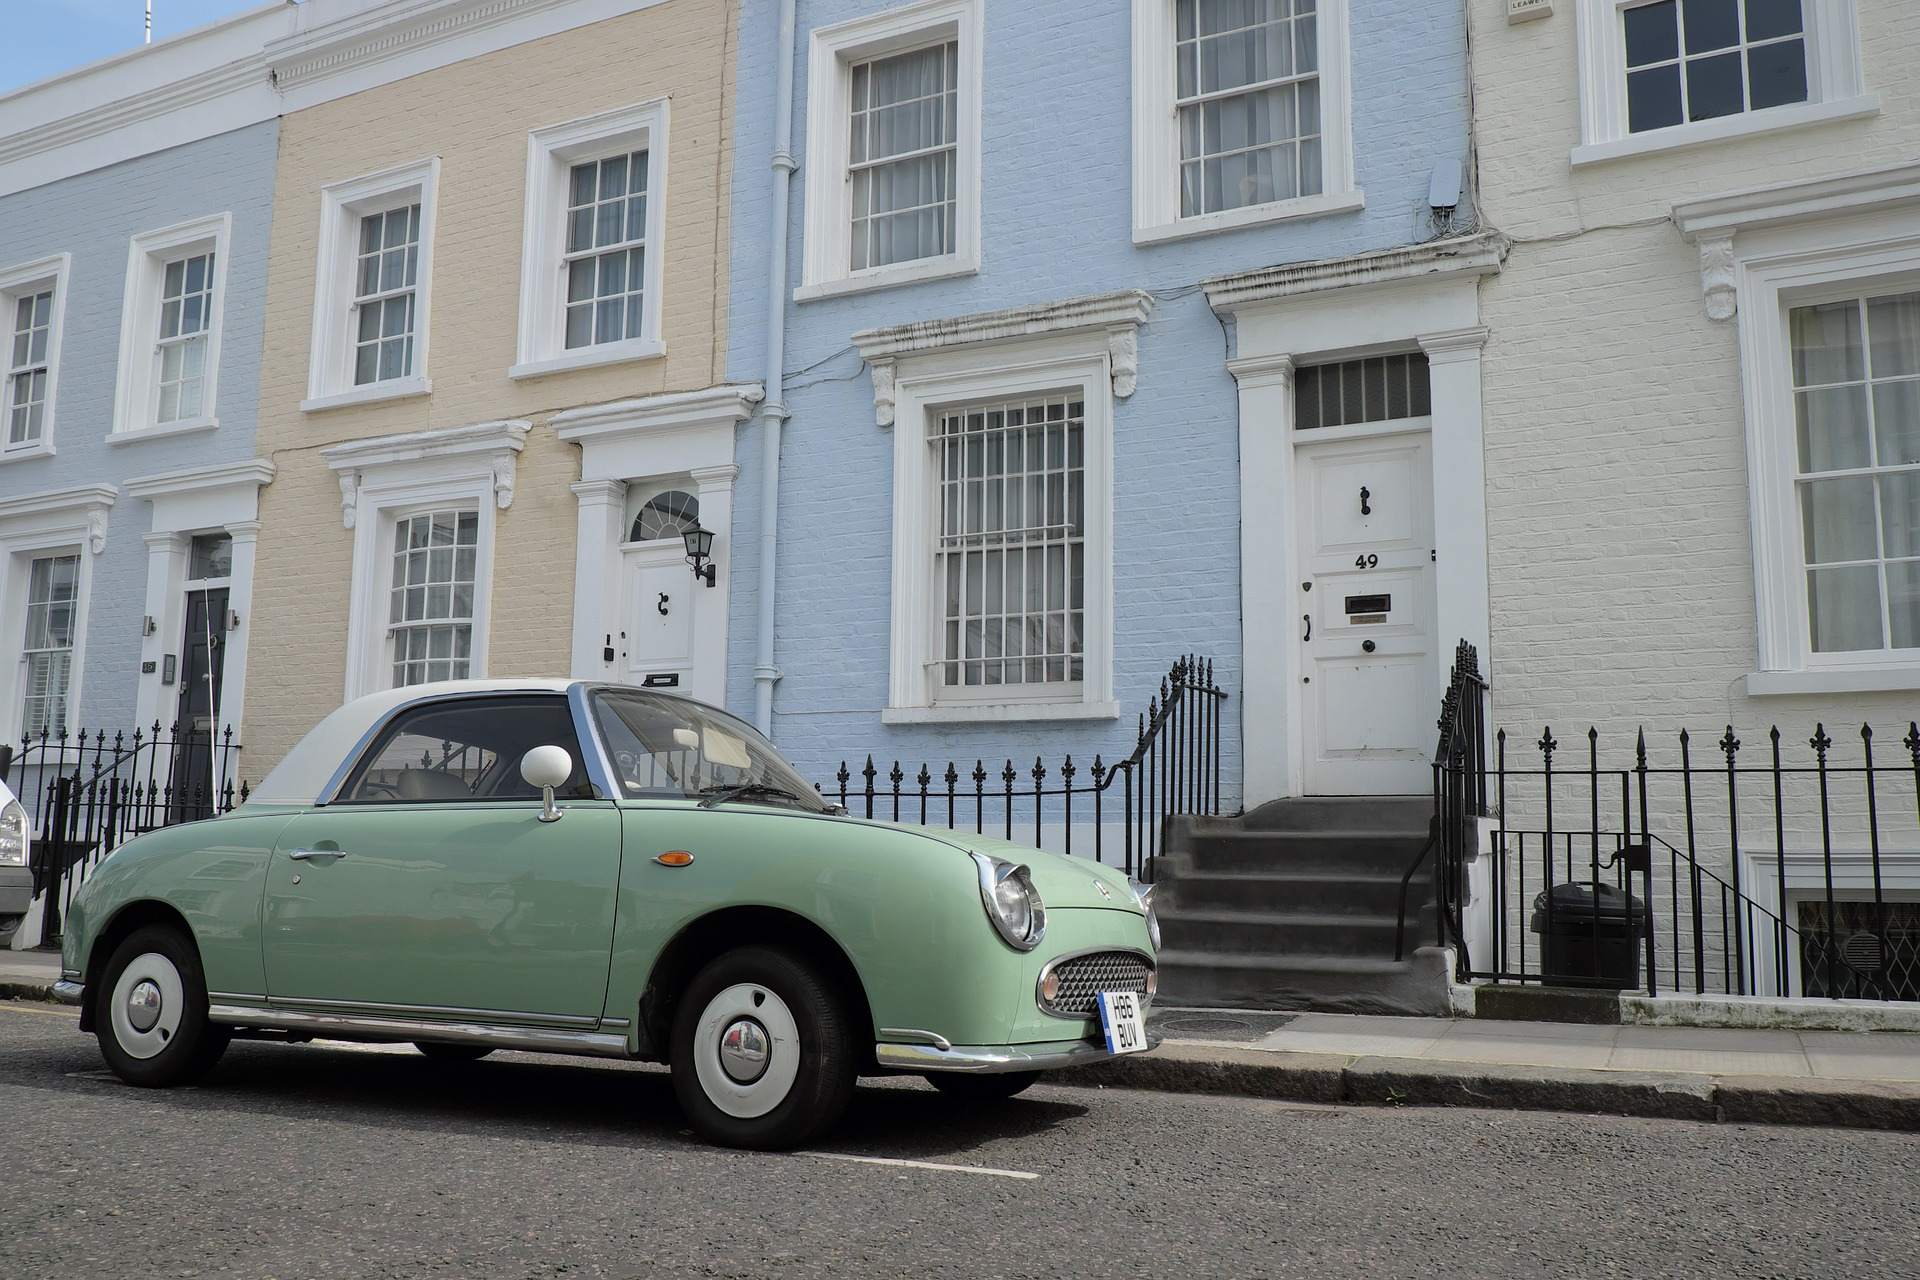 112116-notting-hill-london-england